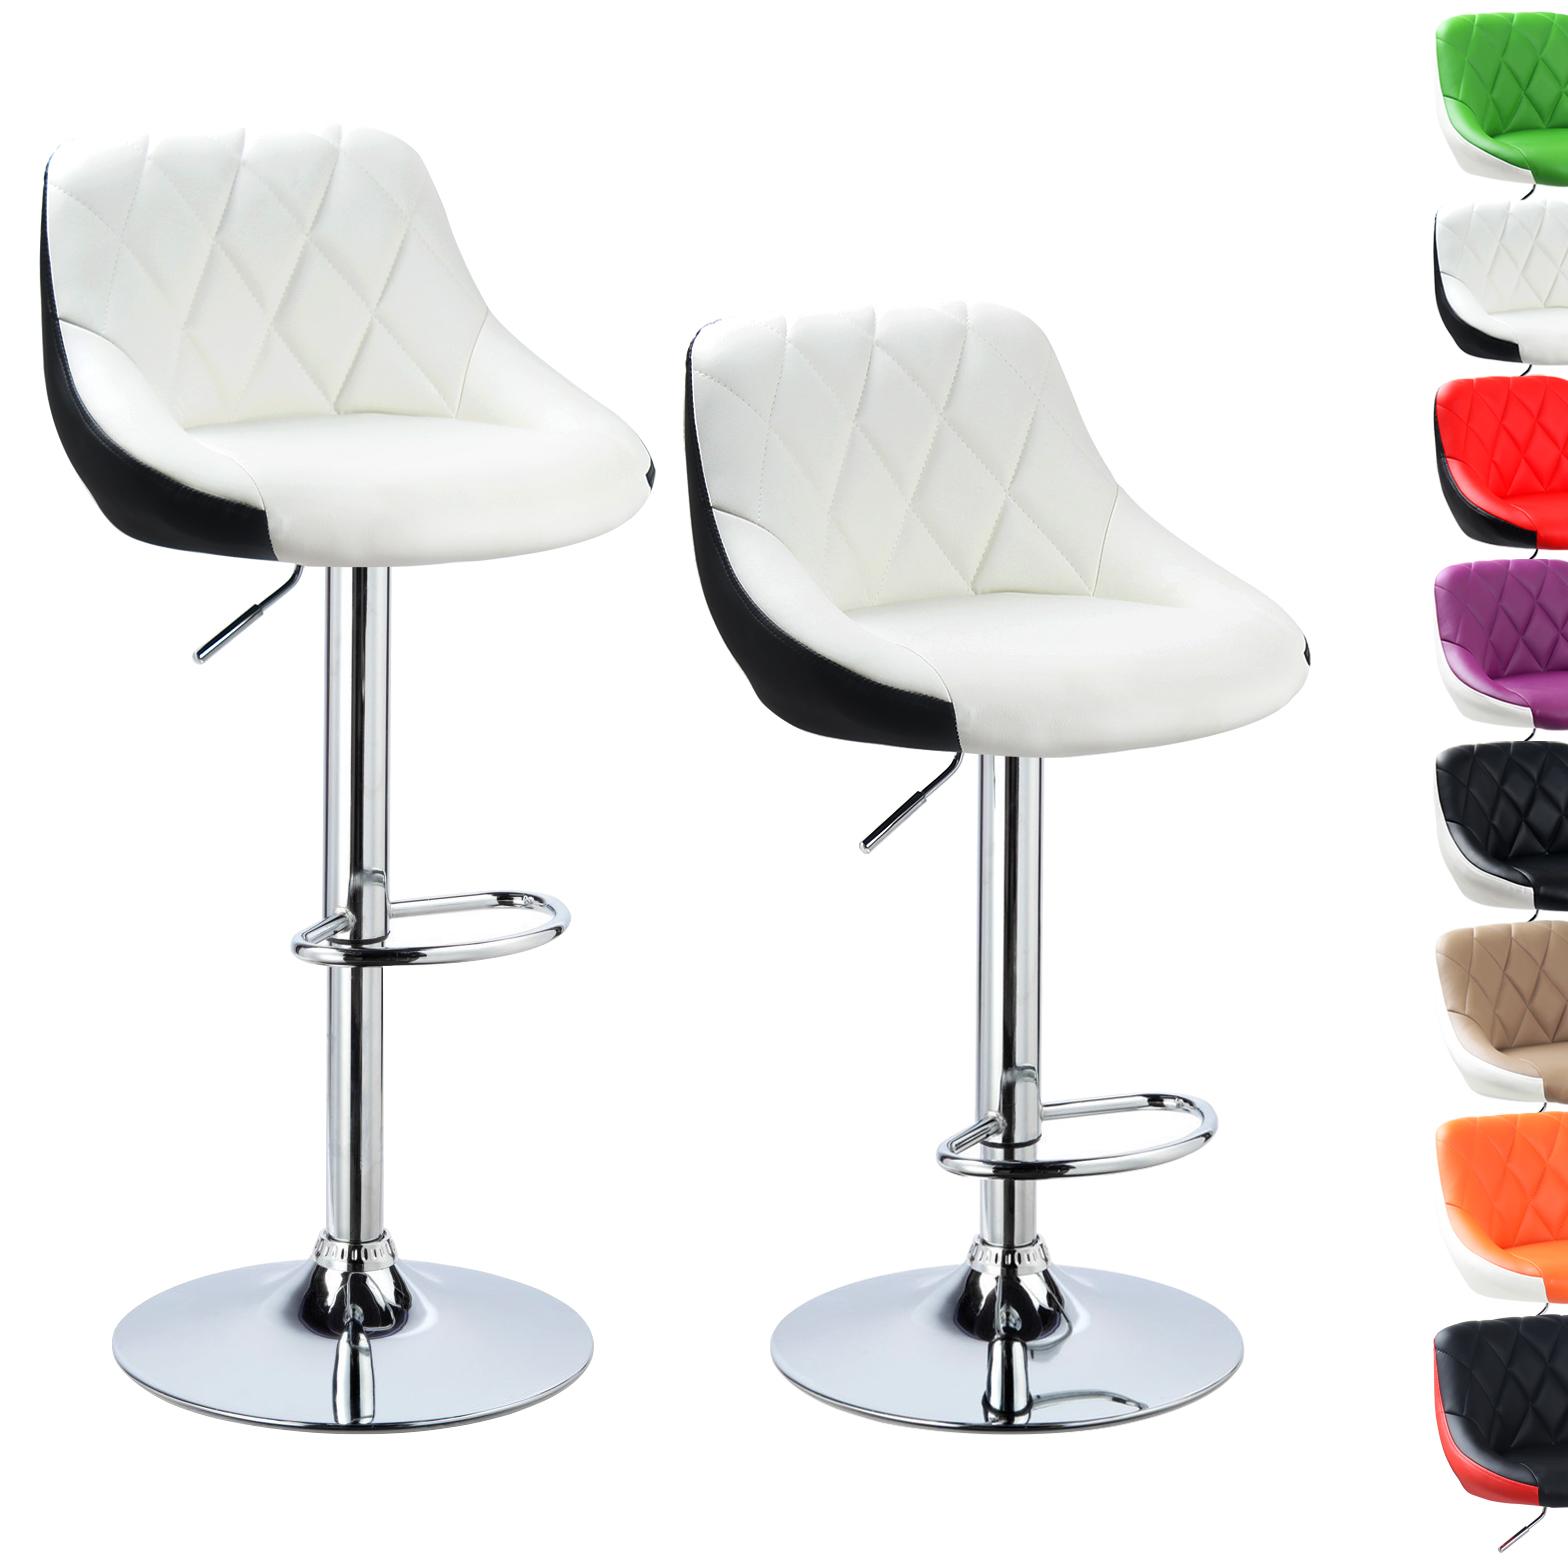 barhocker 2er set tresenhocker barstuhl kunstleder bar hocker bar stools e082 ebay. Black Bedroom Furniture Sets. Home Design Ideas